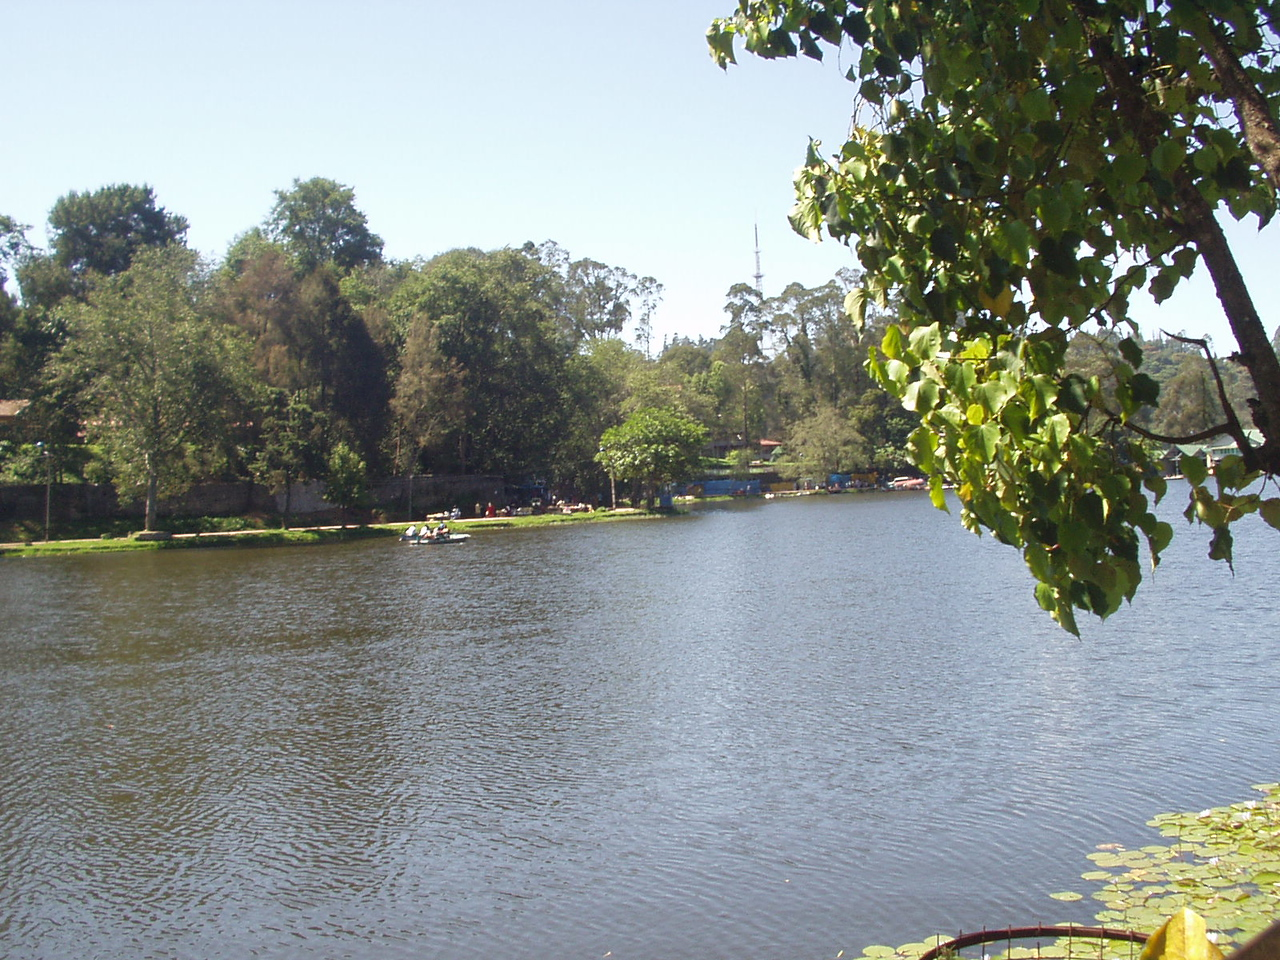 More nice lake